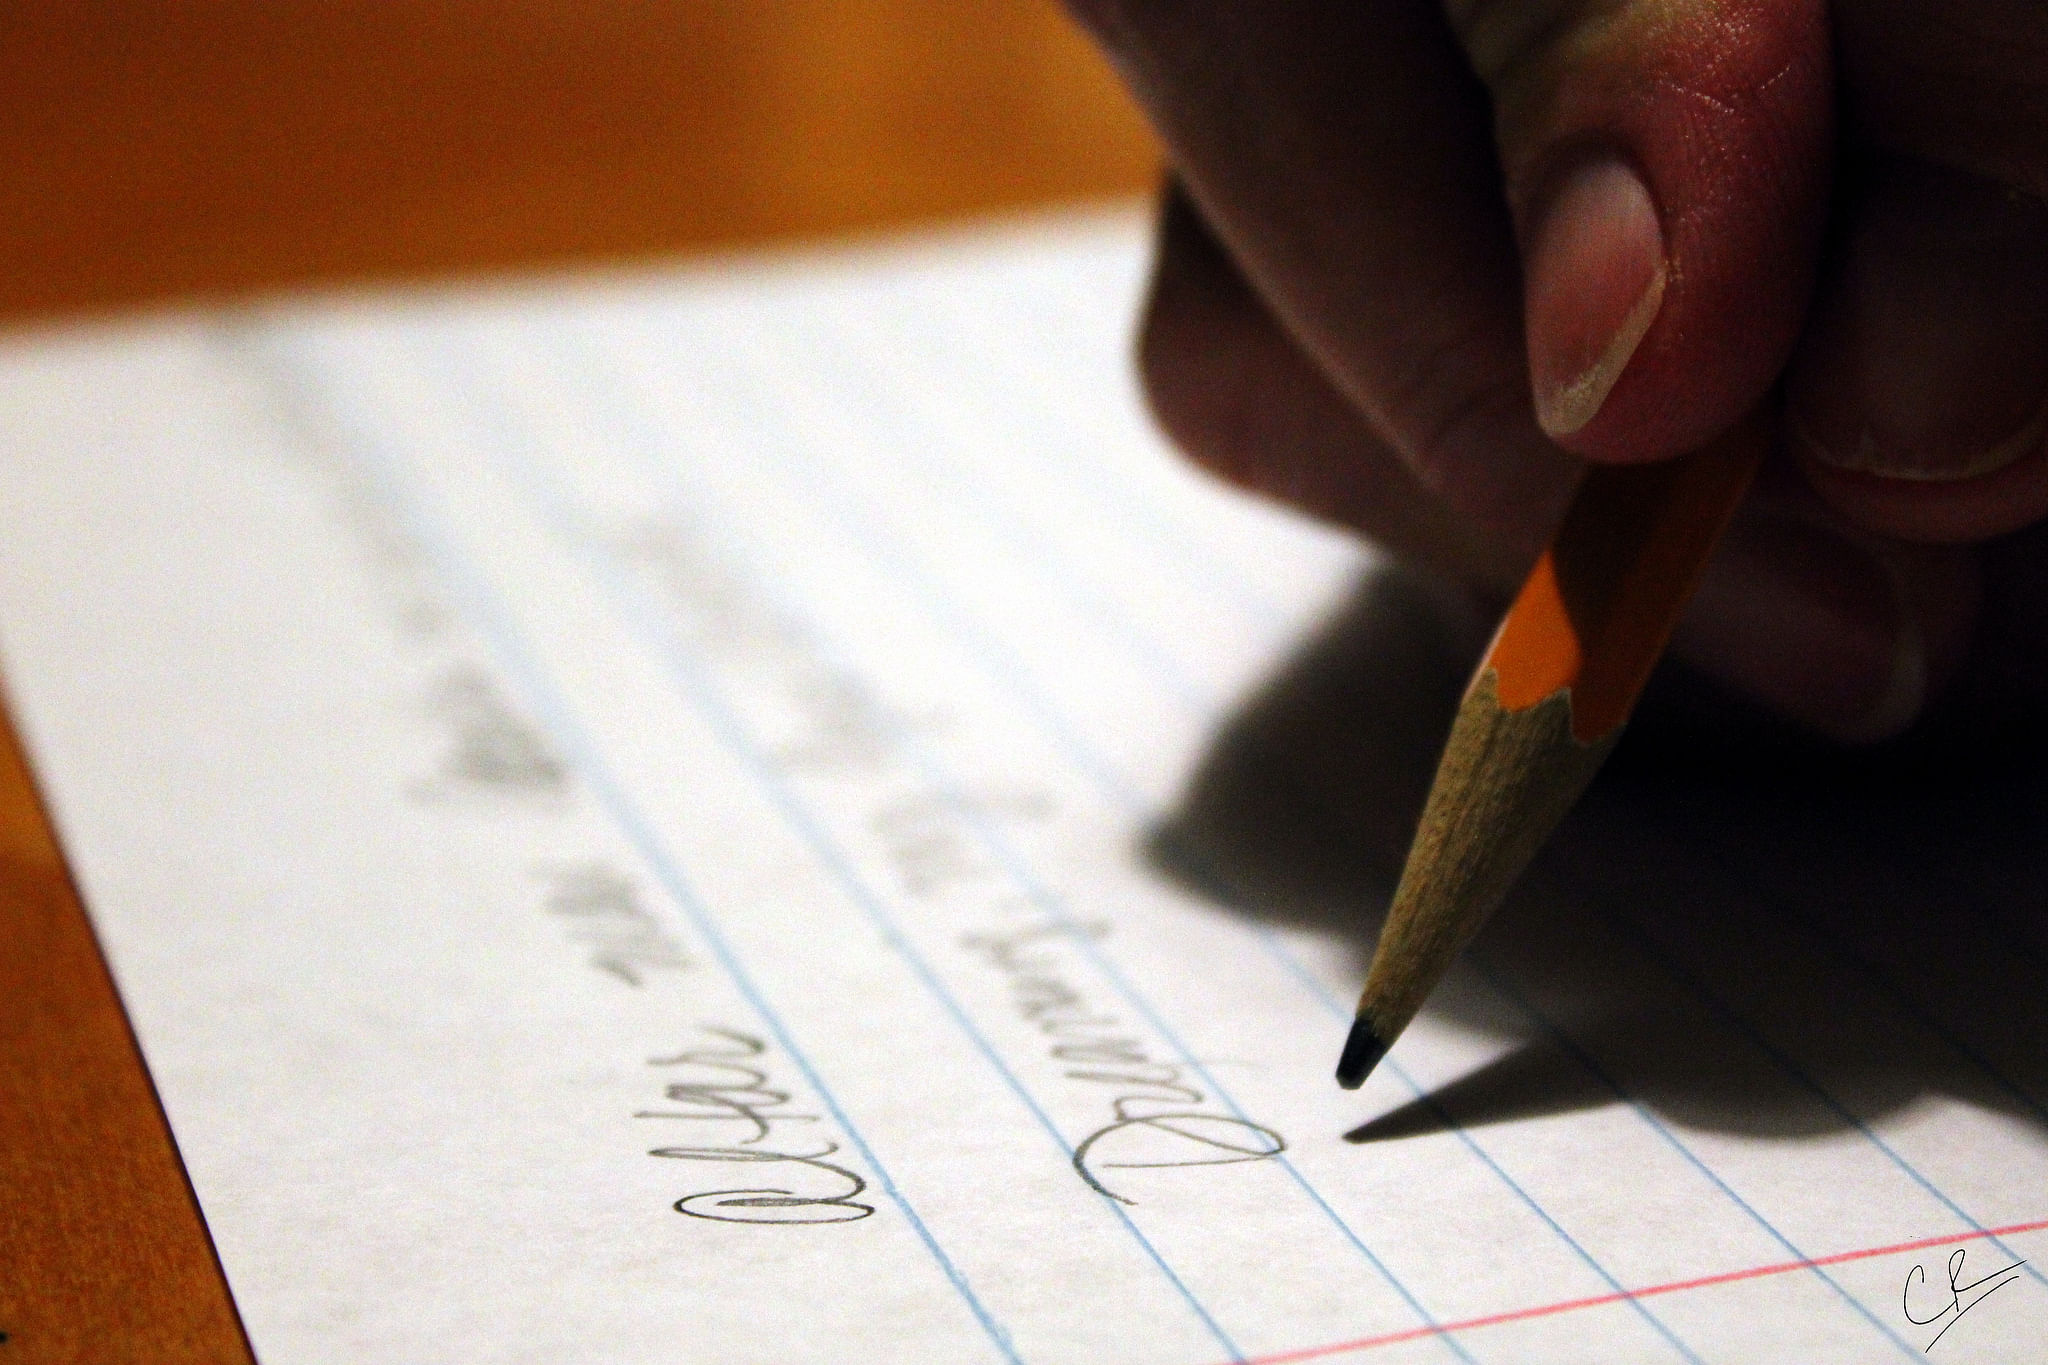 UP Class 12 writer's cramp